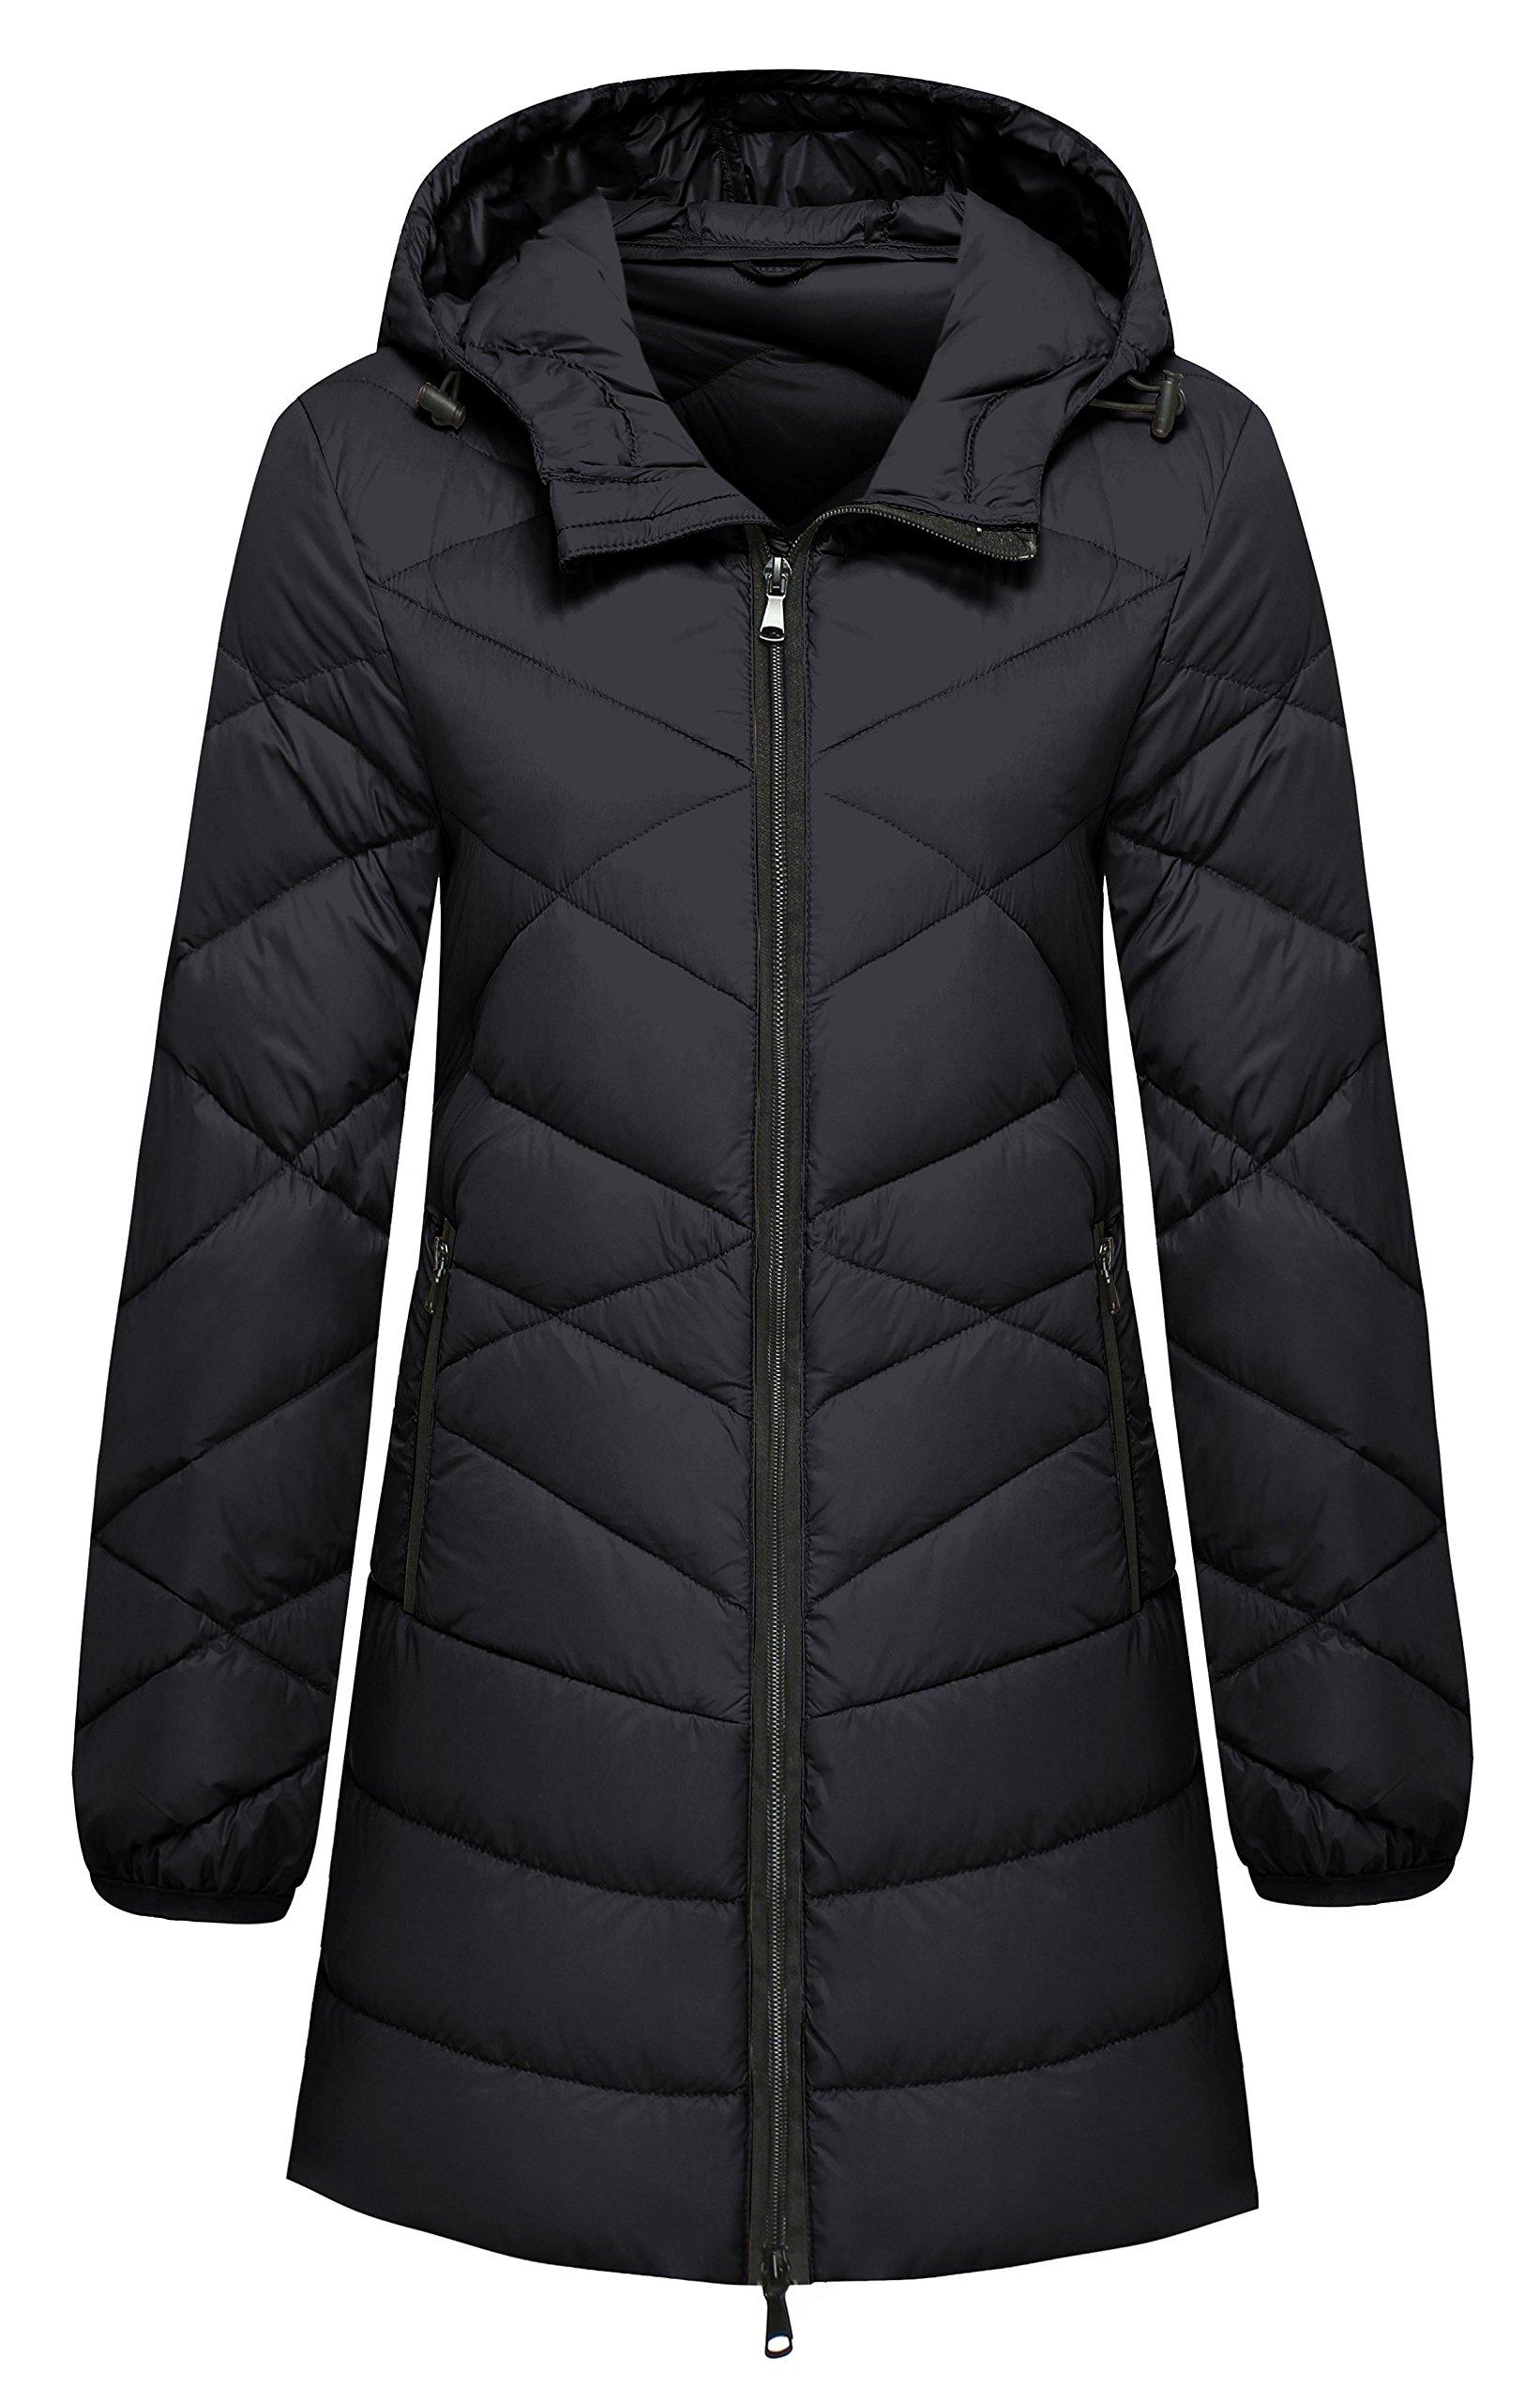 Wantdo Women's Lightweight Packable Puffer Down Coats, Black, Large by Wantdo